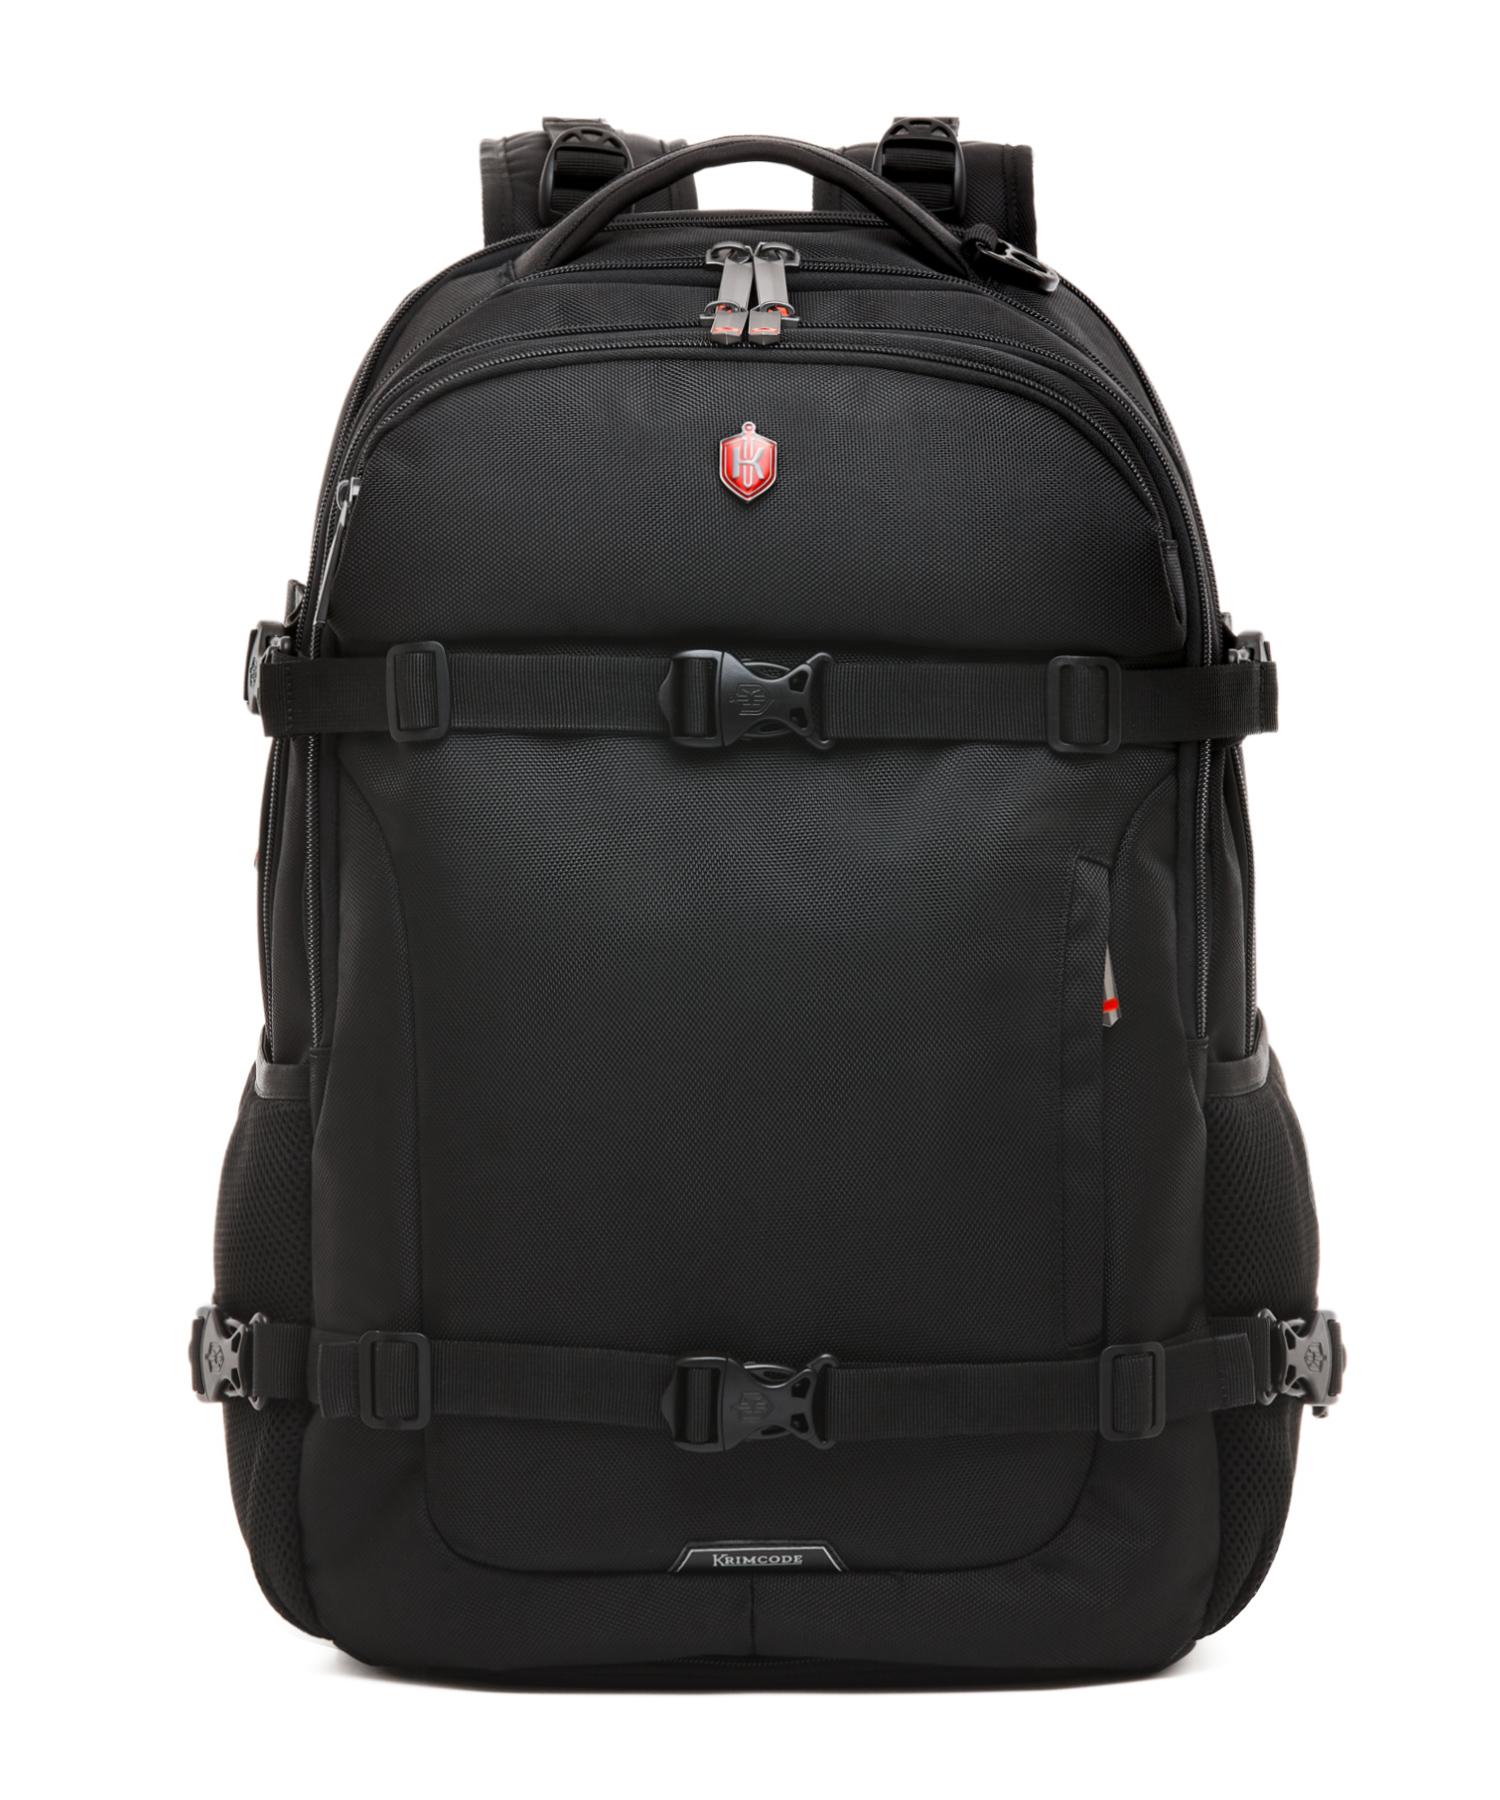 Krimcode Street Casual Notebook Backpack